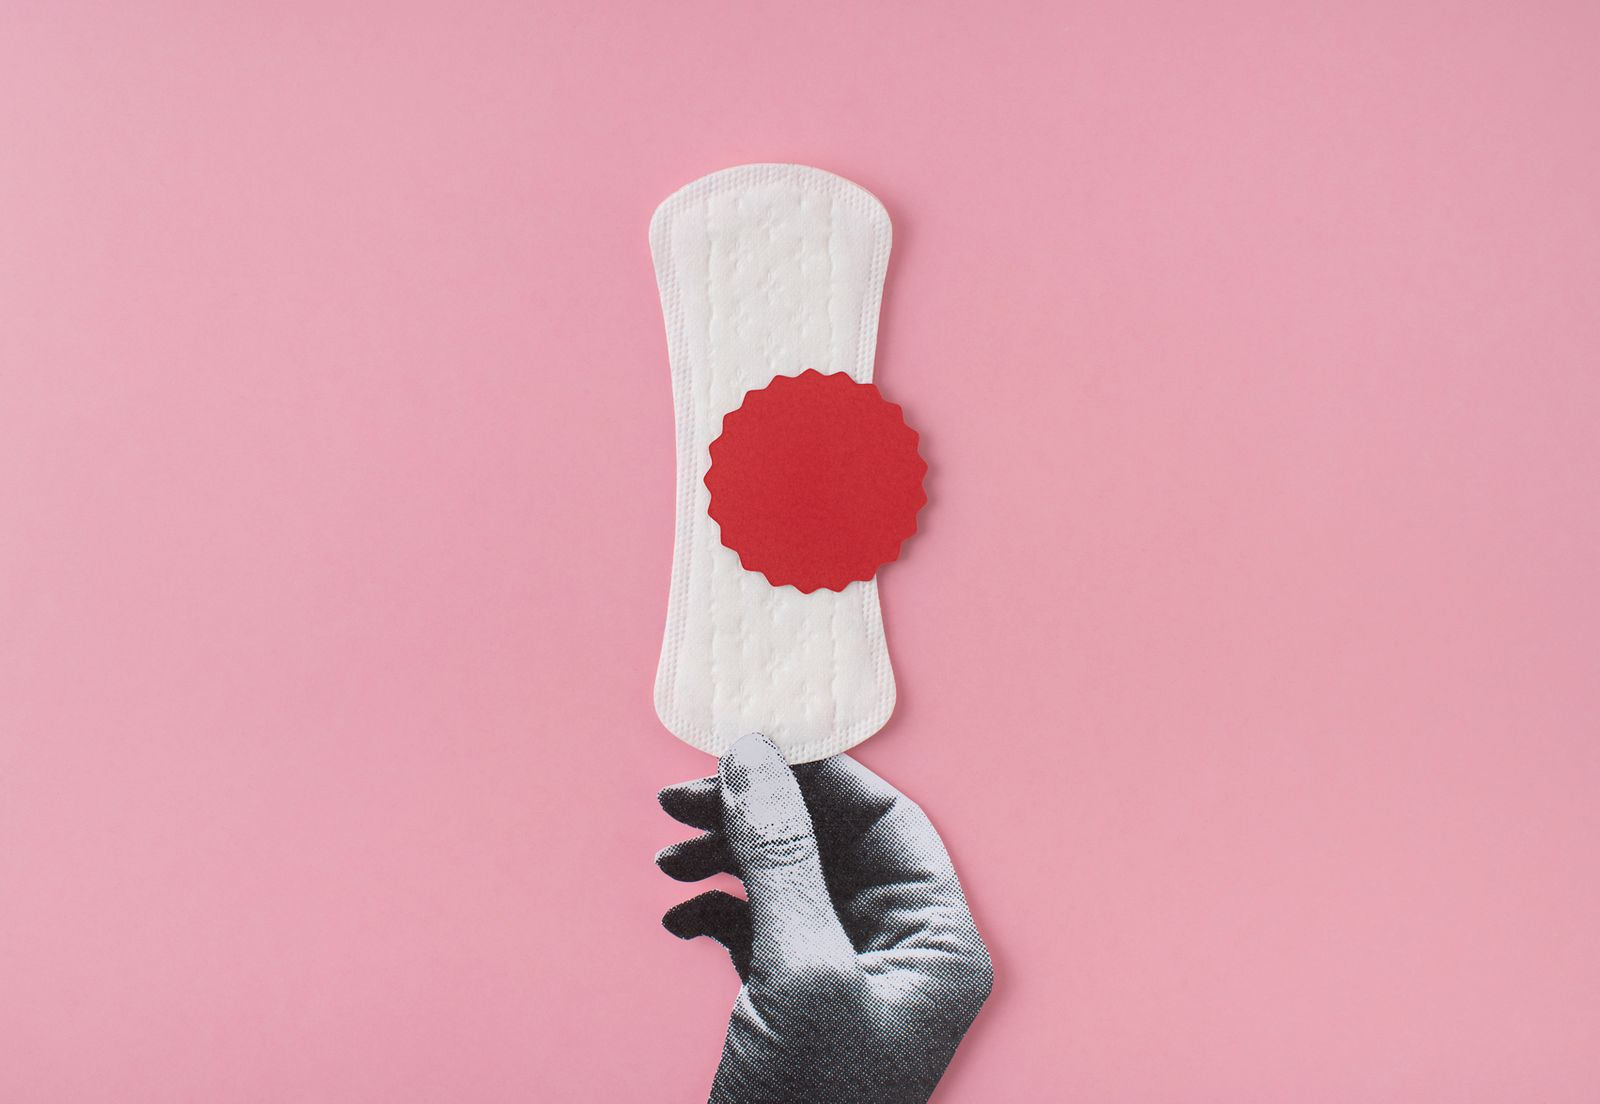 Menstruation Collage